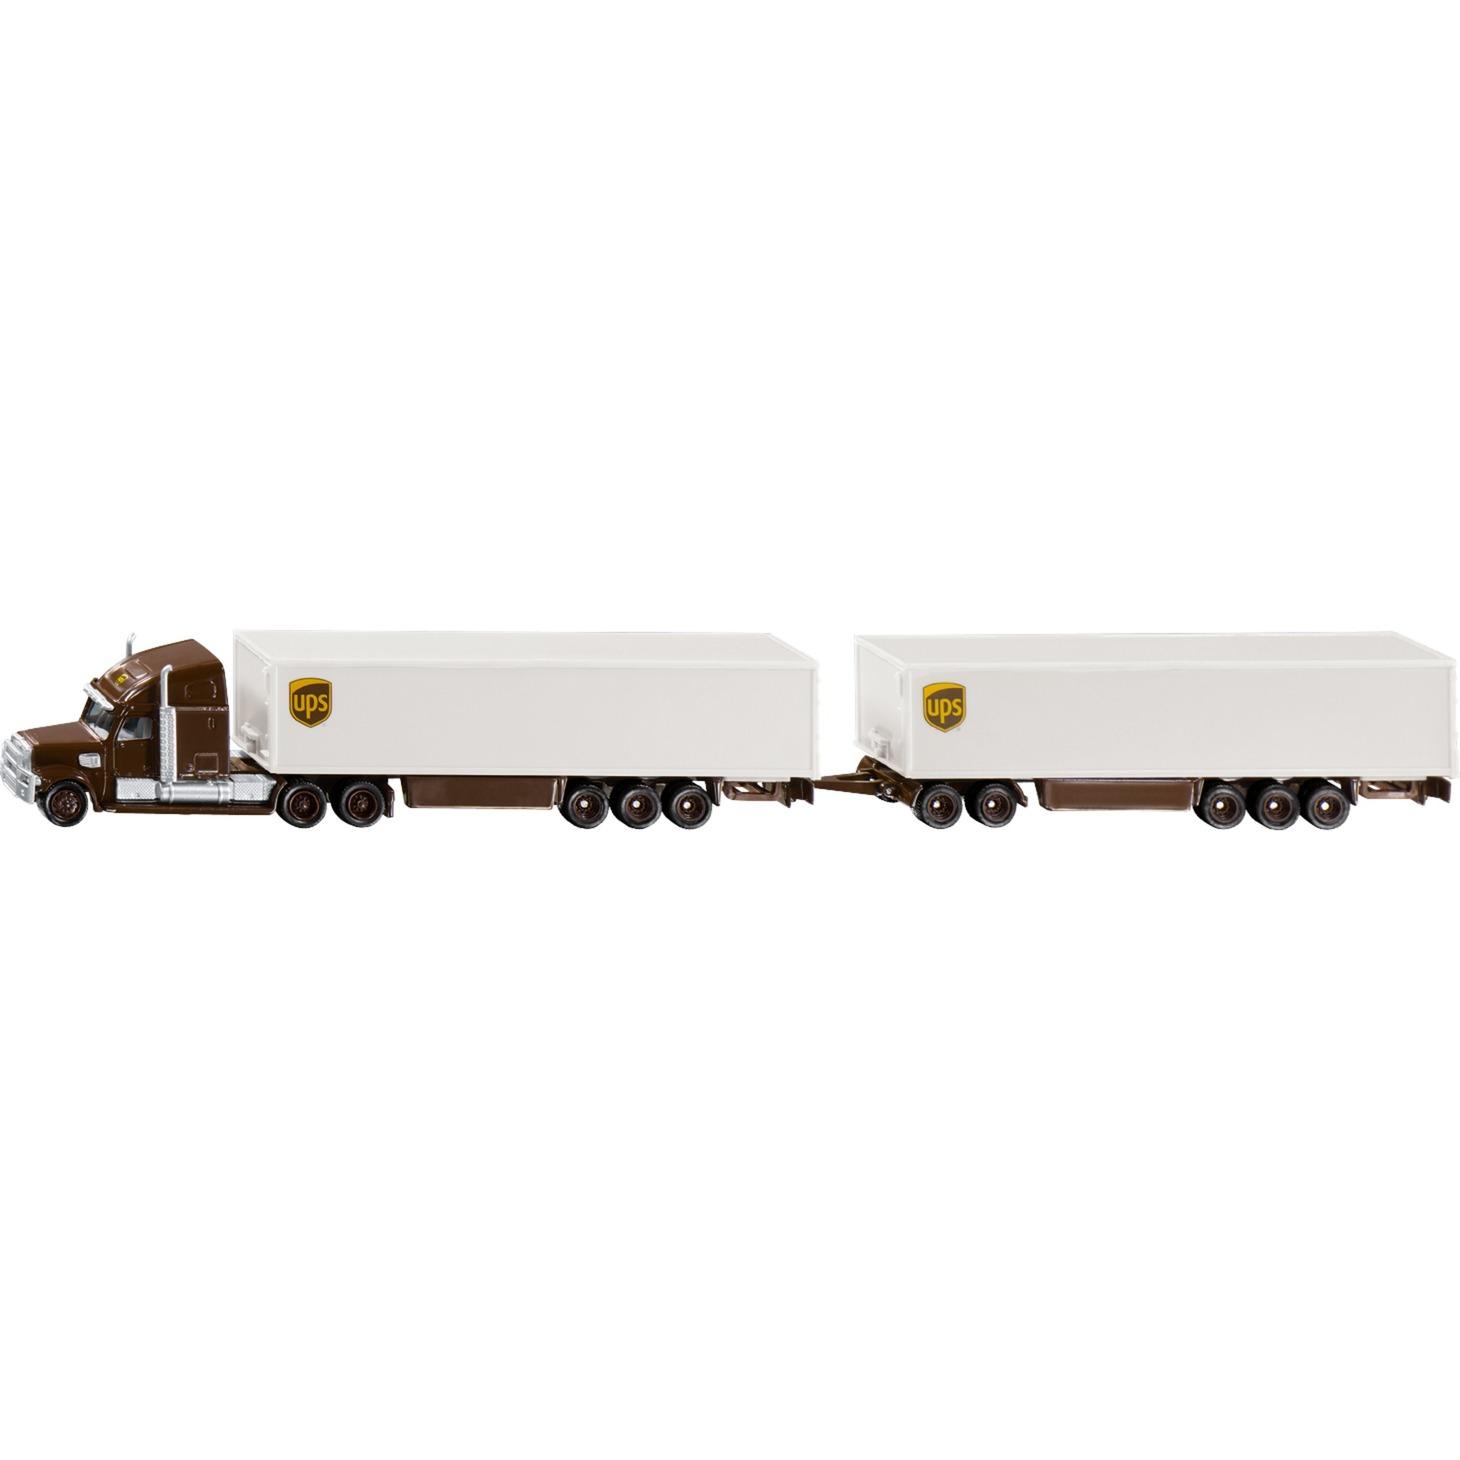 1806 modelo de vehículo de tierra Previamente montado Modelo a escala de tren de carretera 1:87, Automóvil de construcción